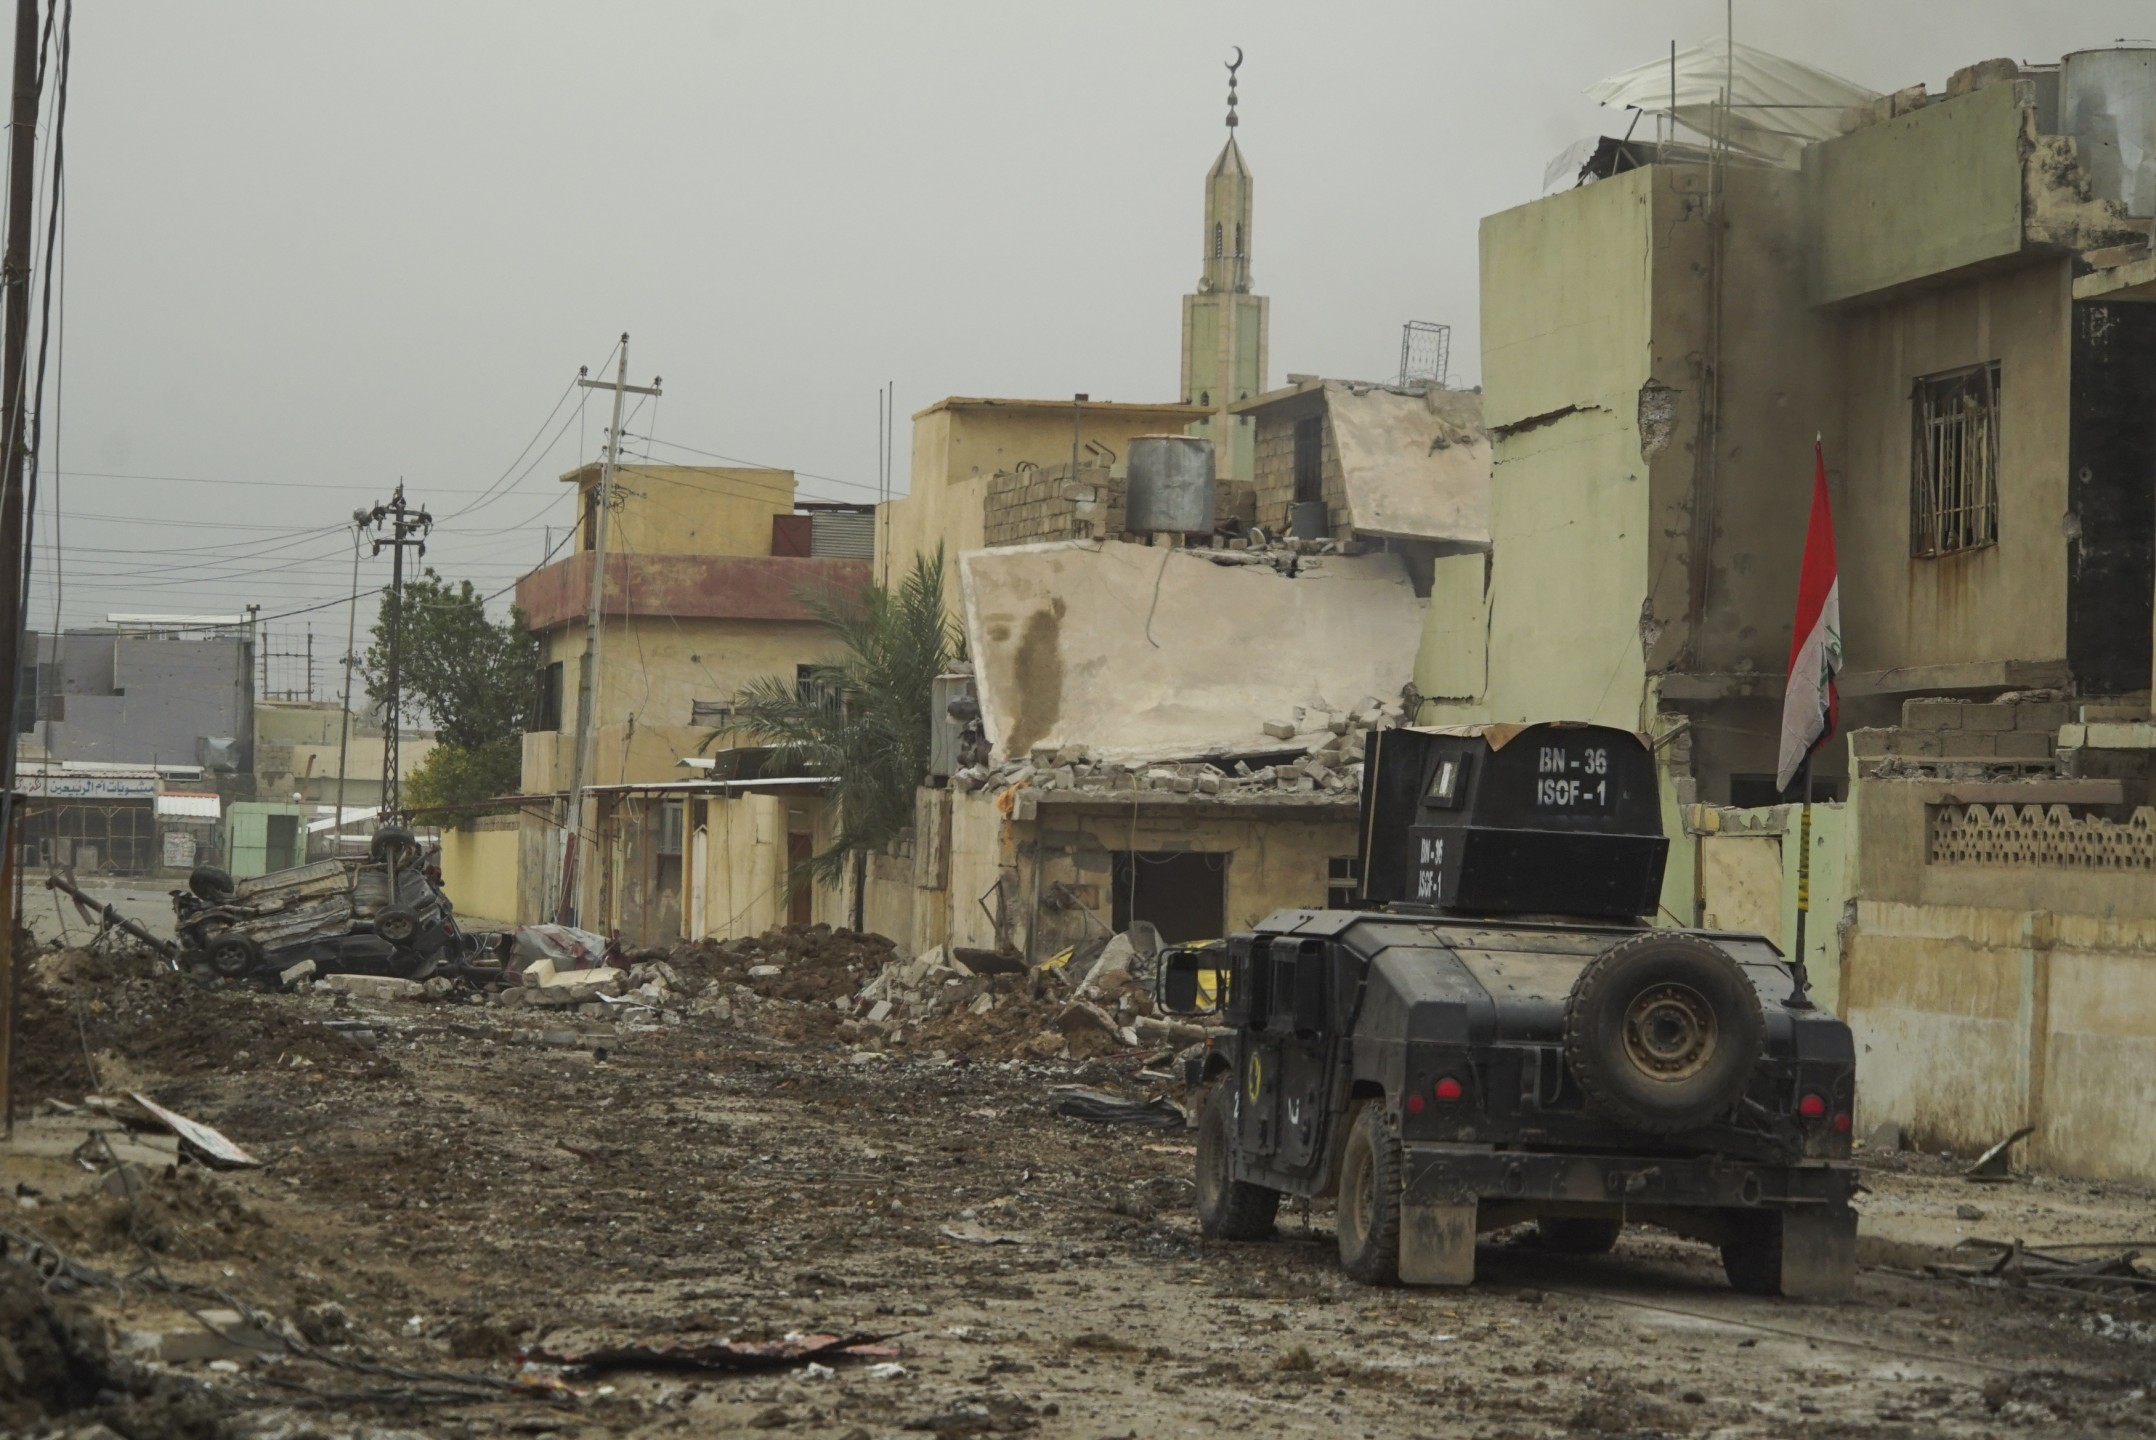 isof_apc_on_the_street_of_mosul_northern_iraq_western_asia._16_november_2016.jpg